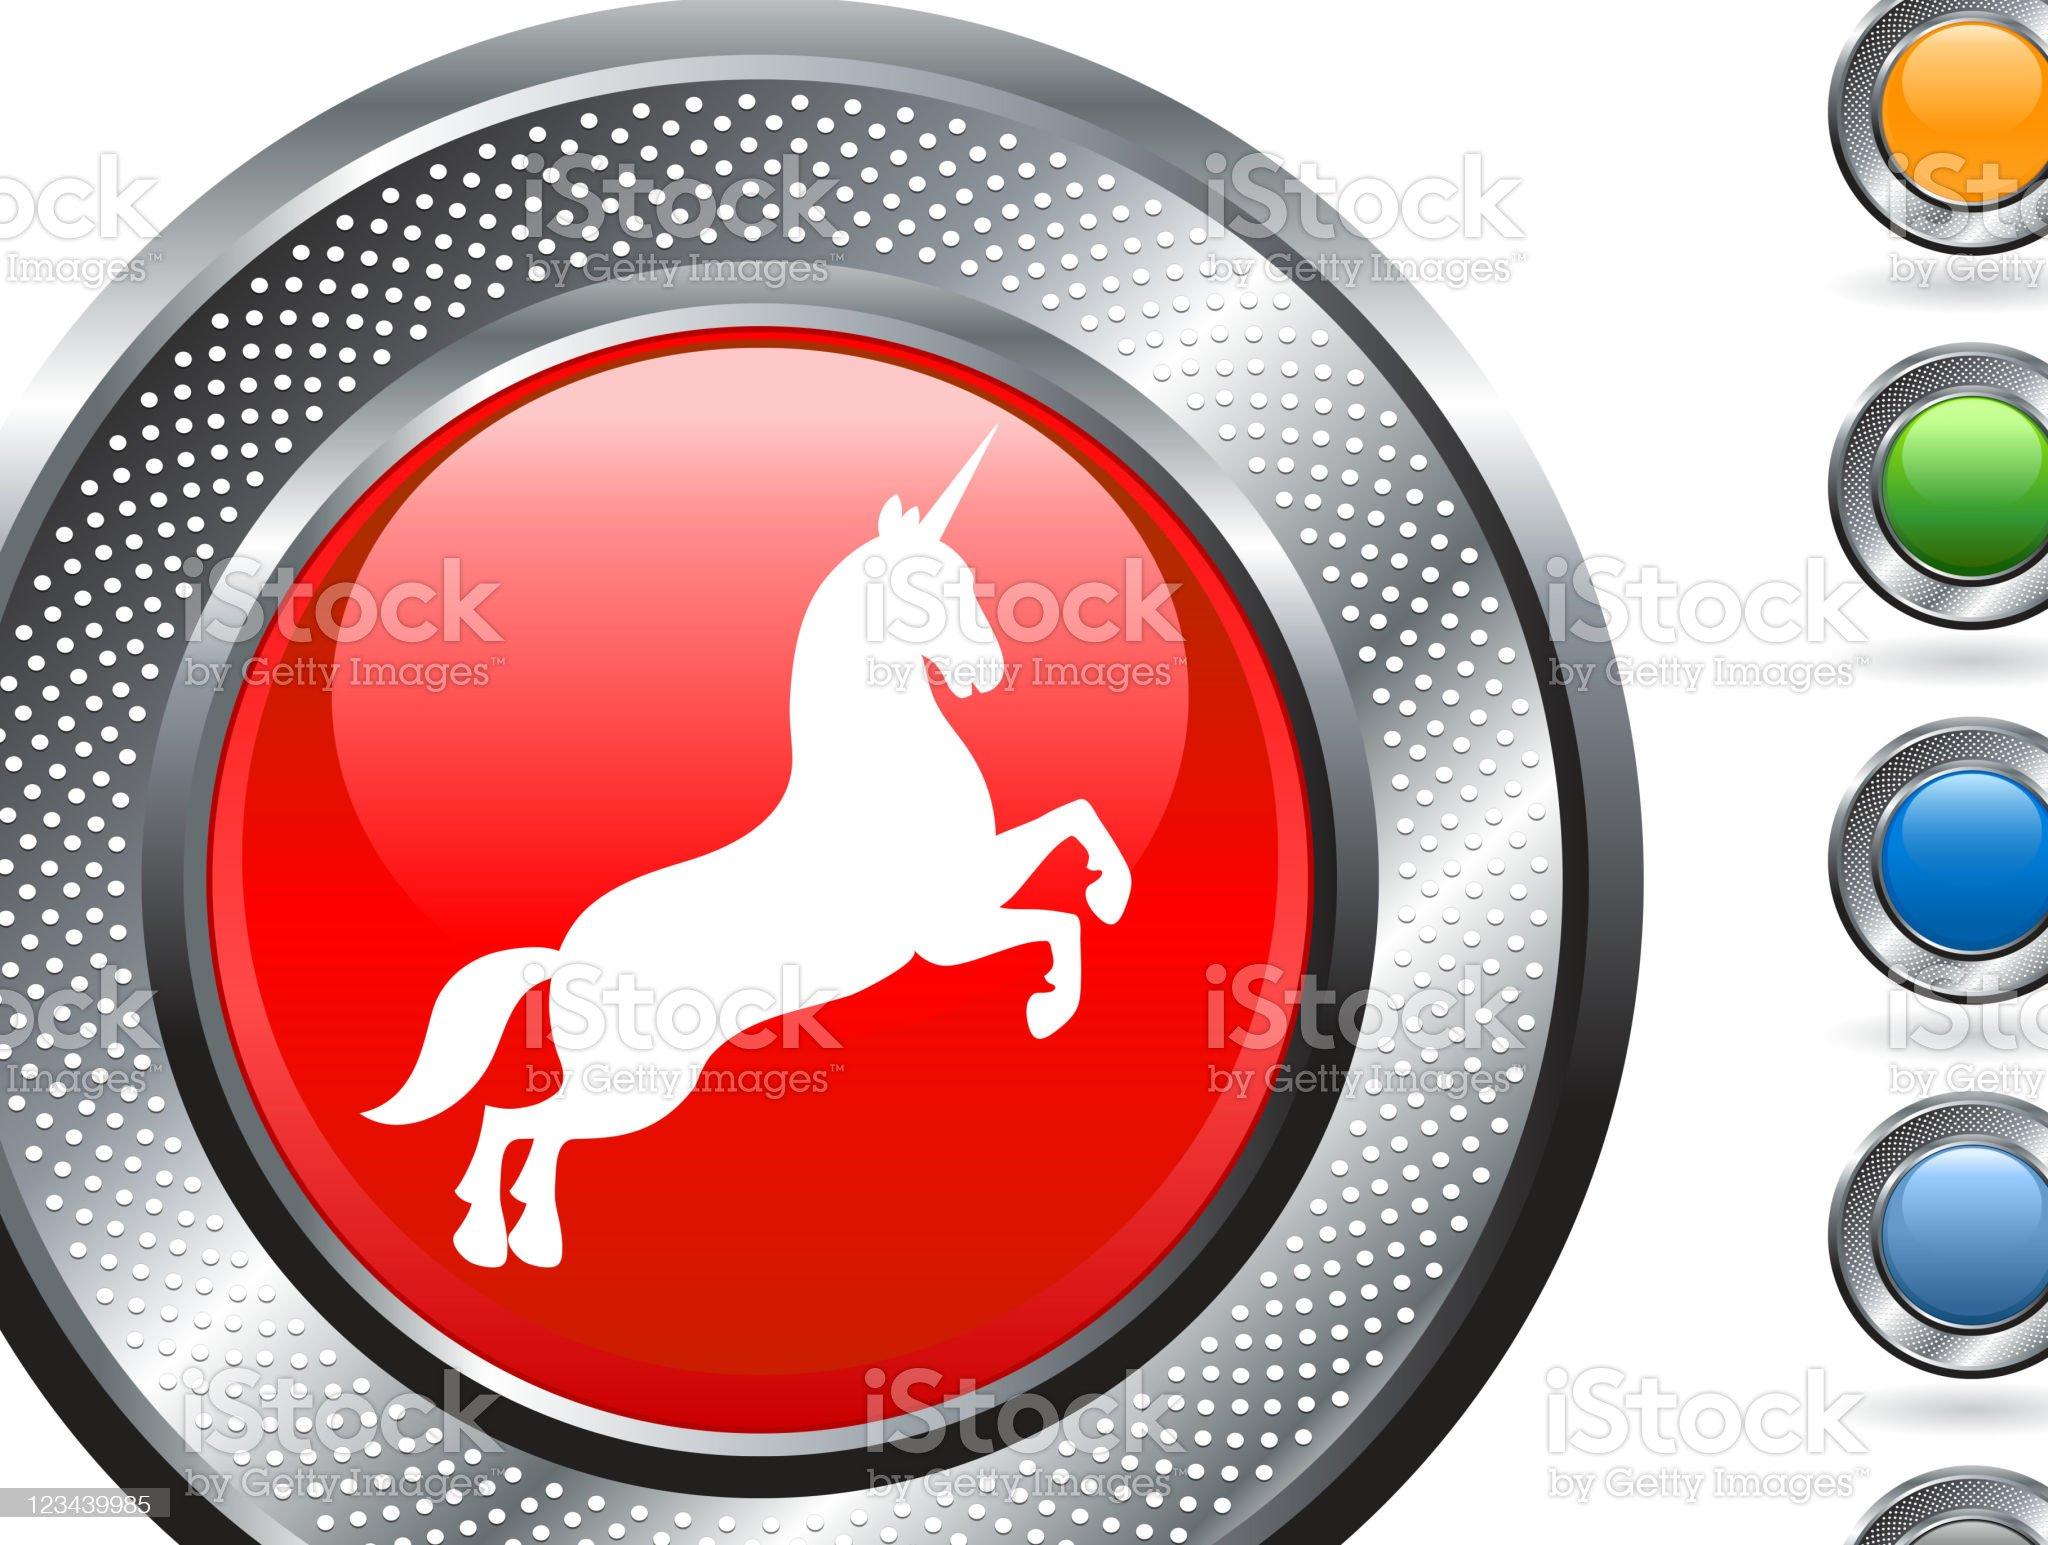 unicorn royalty free vector art on metallic button royalty-free stock vector art